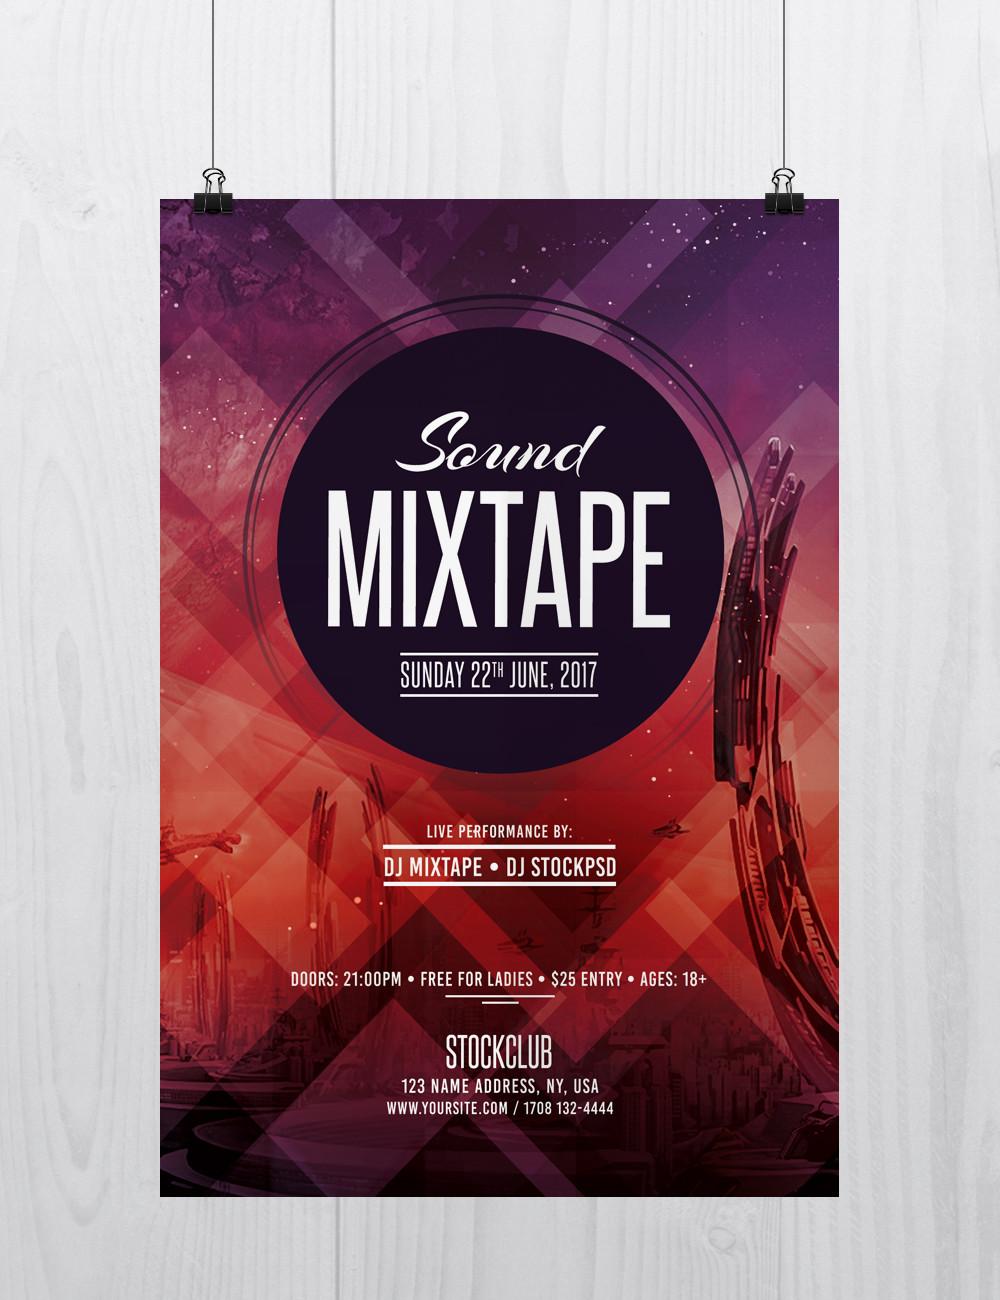 Sound Mixtape – Free PSD Flyer Template